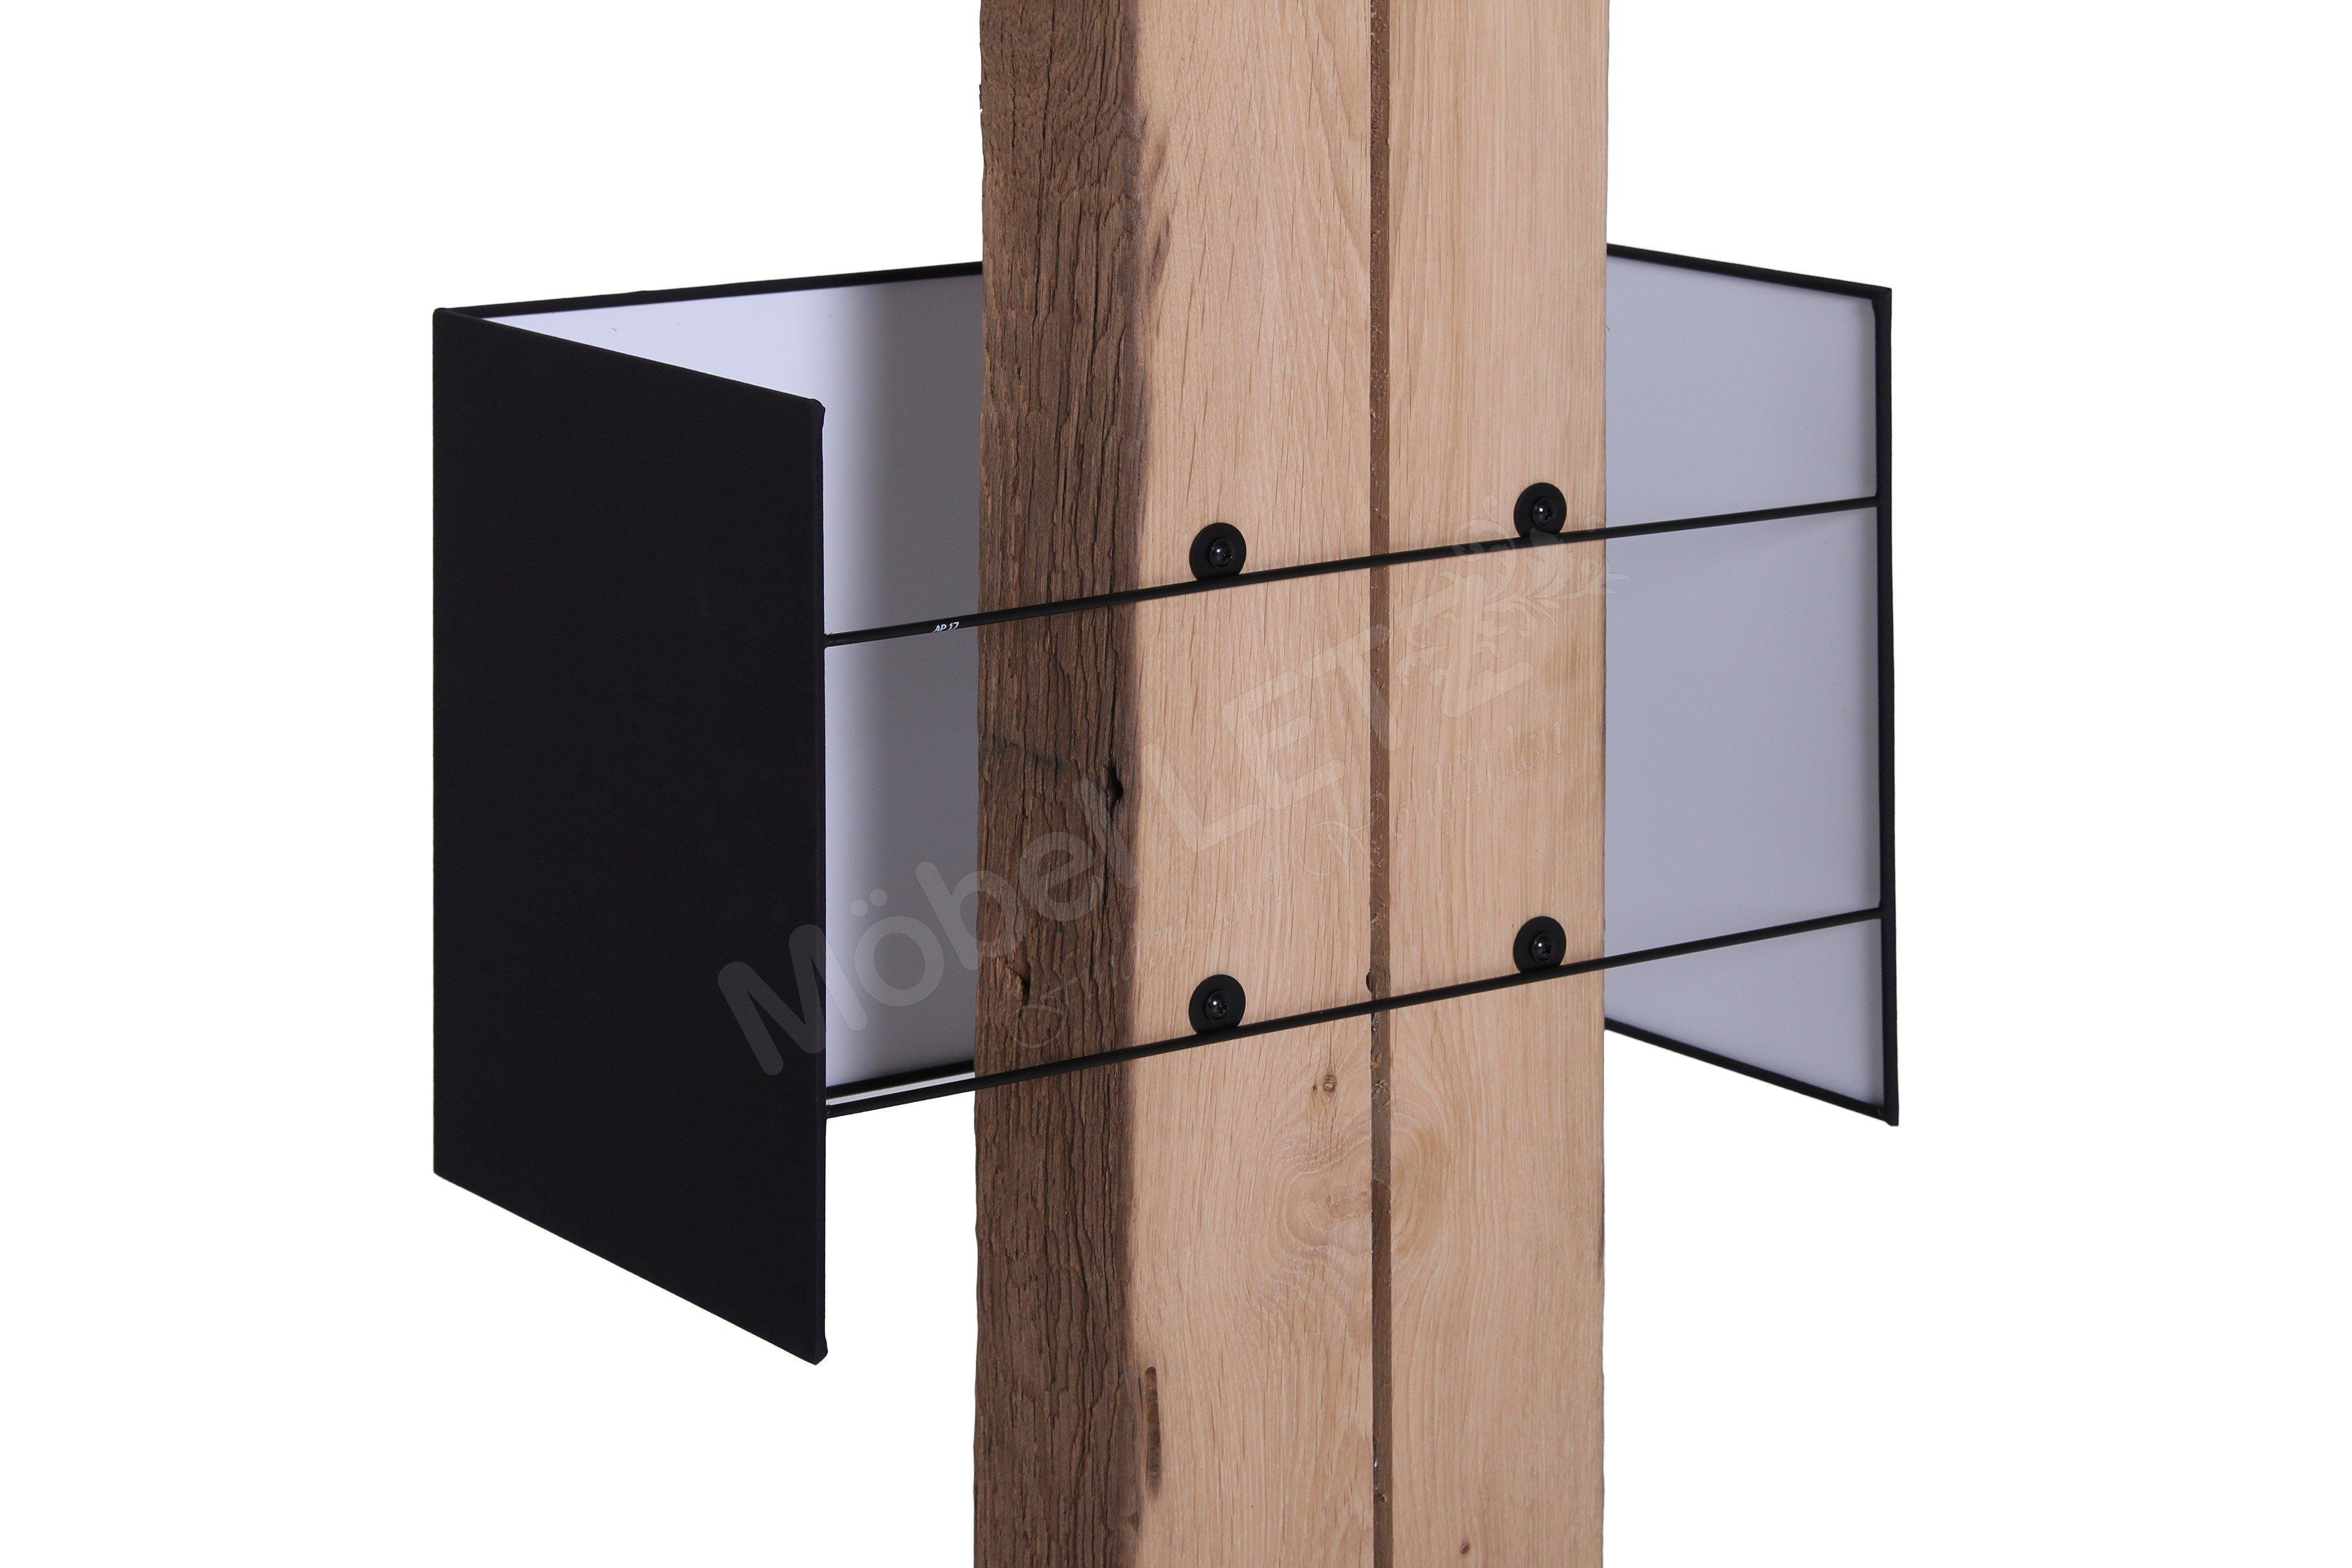 sprenger stehlampe 12 36 eichenholz m bel letz ihr. Black Bedroom Furniture Sets. Home Design Ideas